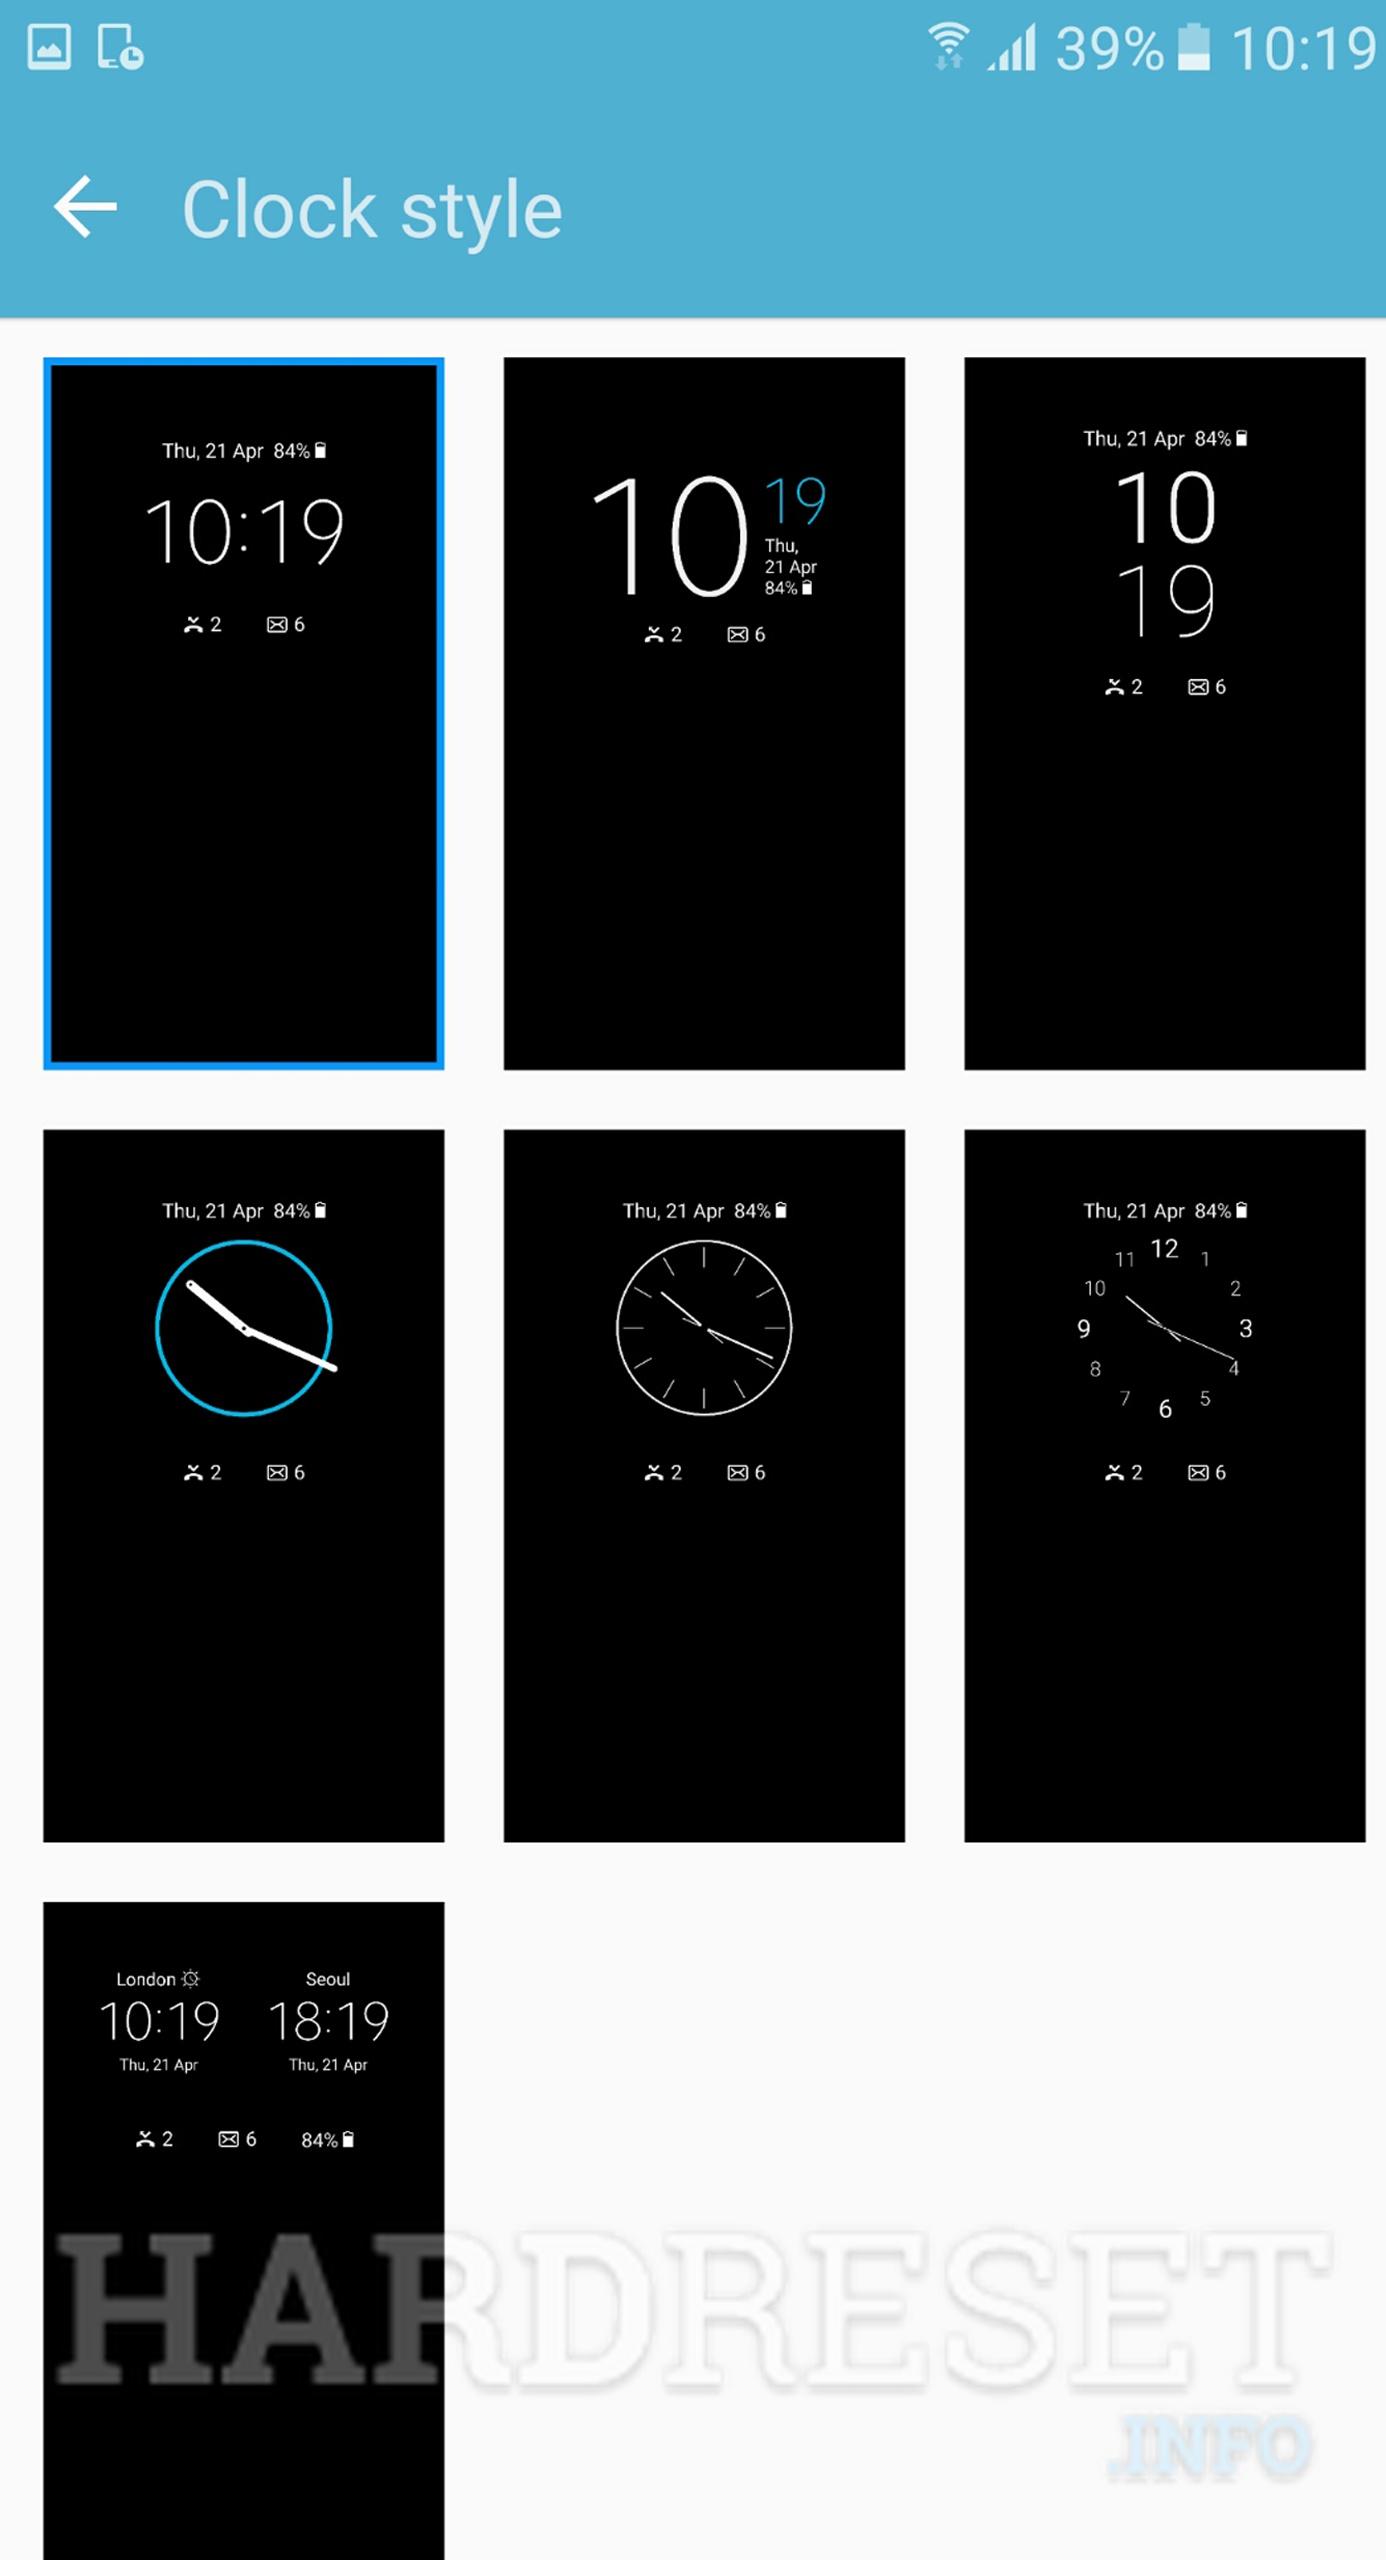 Change Wallpaper Samsung Galaxy J7 How To Hardreset Info